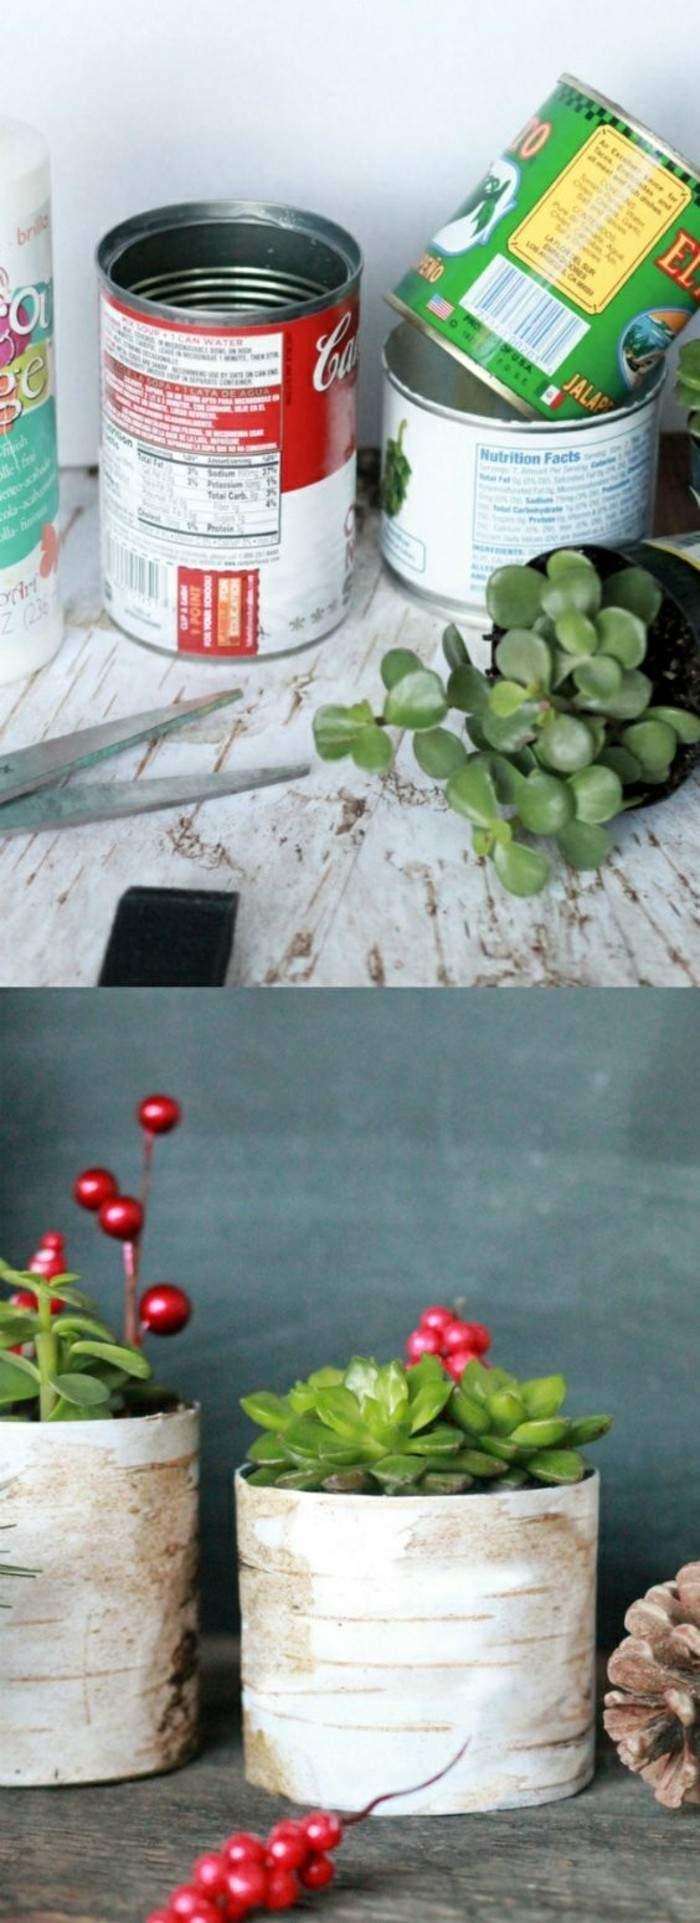 kreatives basteln konservendose schere gr C3 BCne pflanze tannenzapfen blument C3 B6pfe